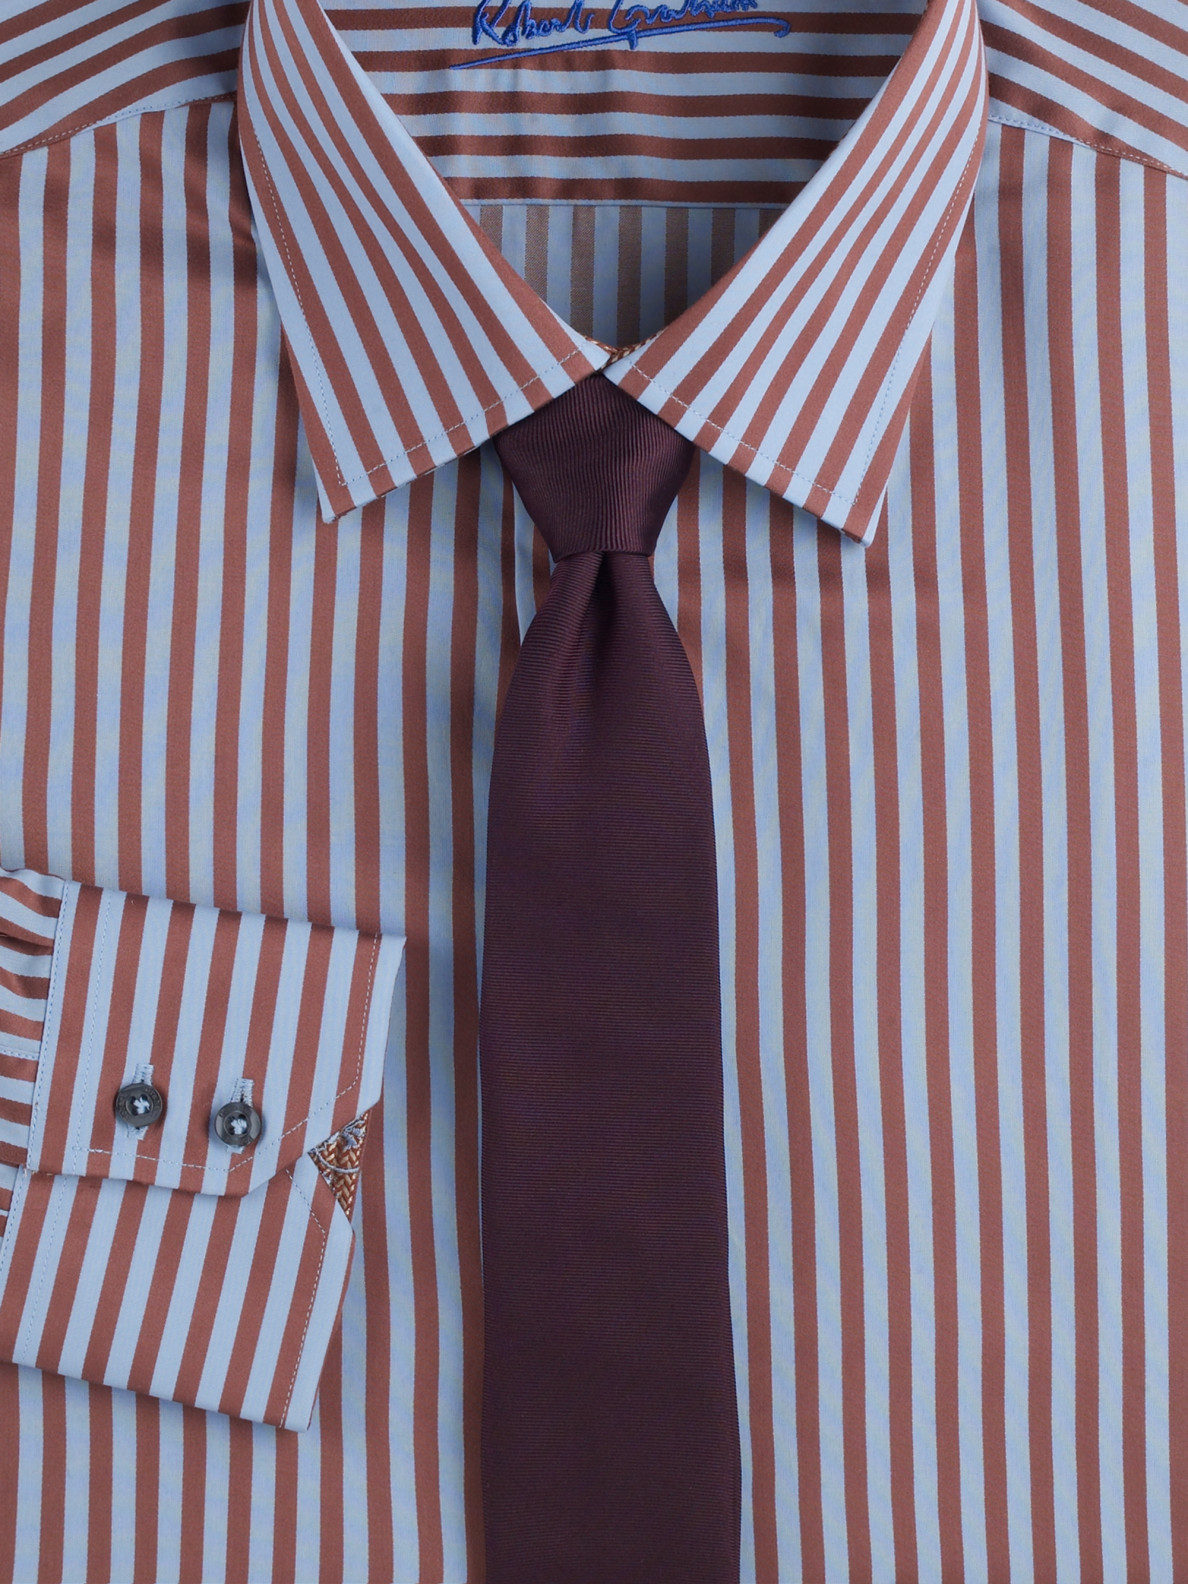 Robert Graham Striped Dress Shirt In Brown For Men Lyst